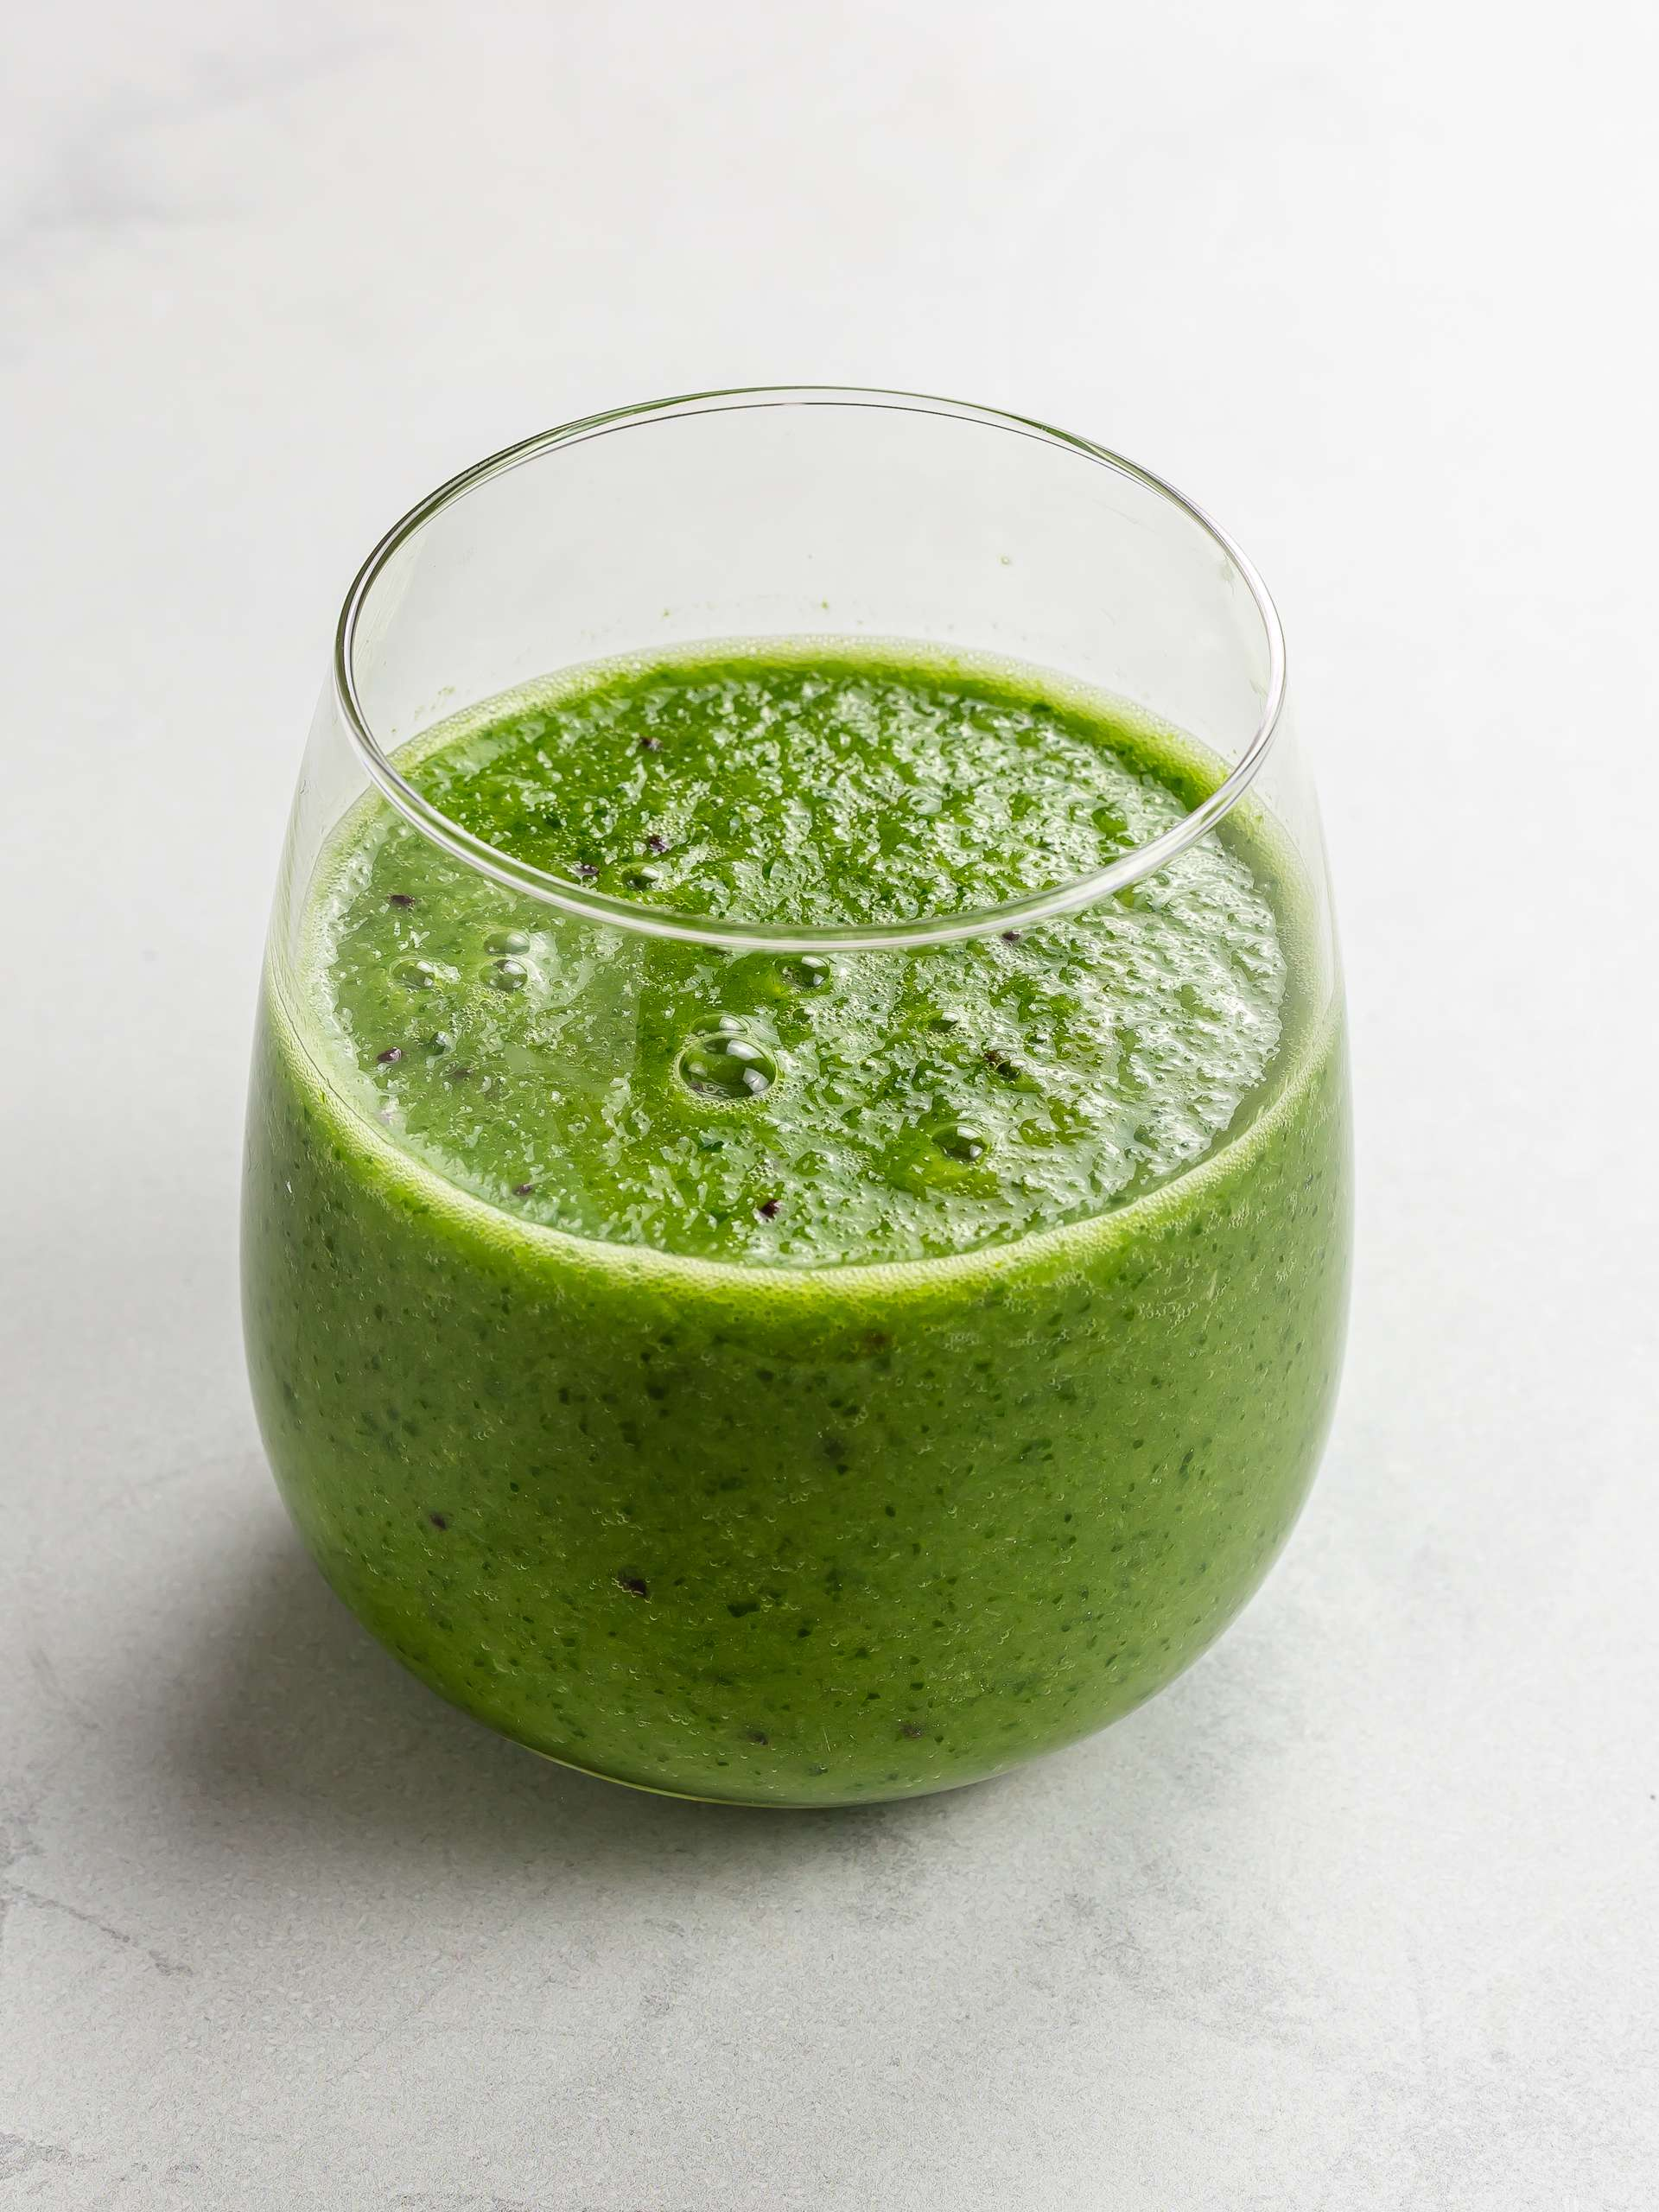 alkaline green smoothie in a glass